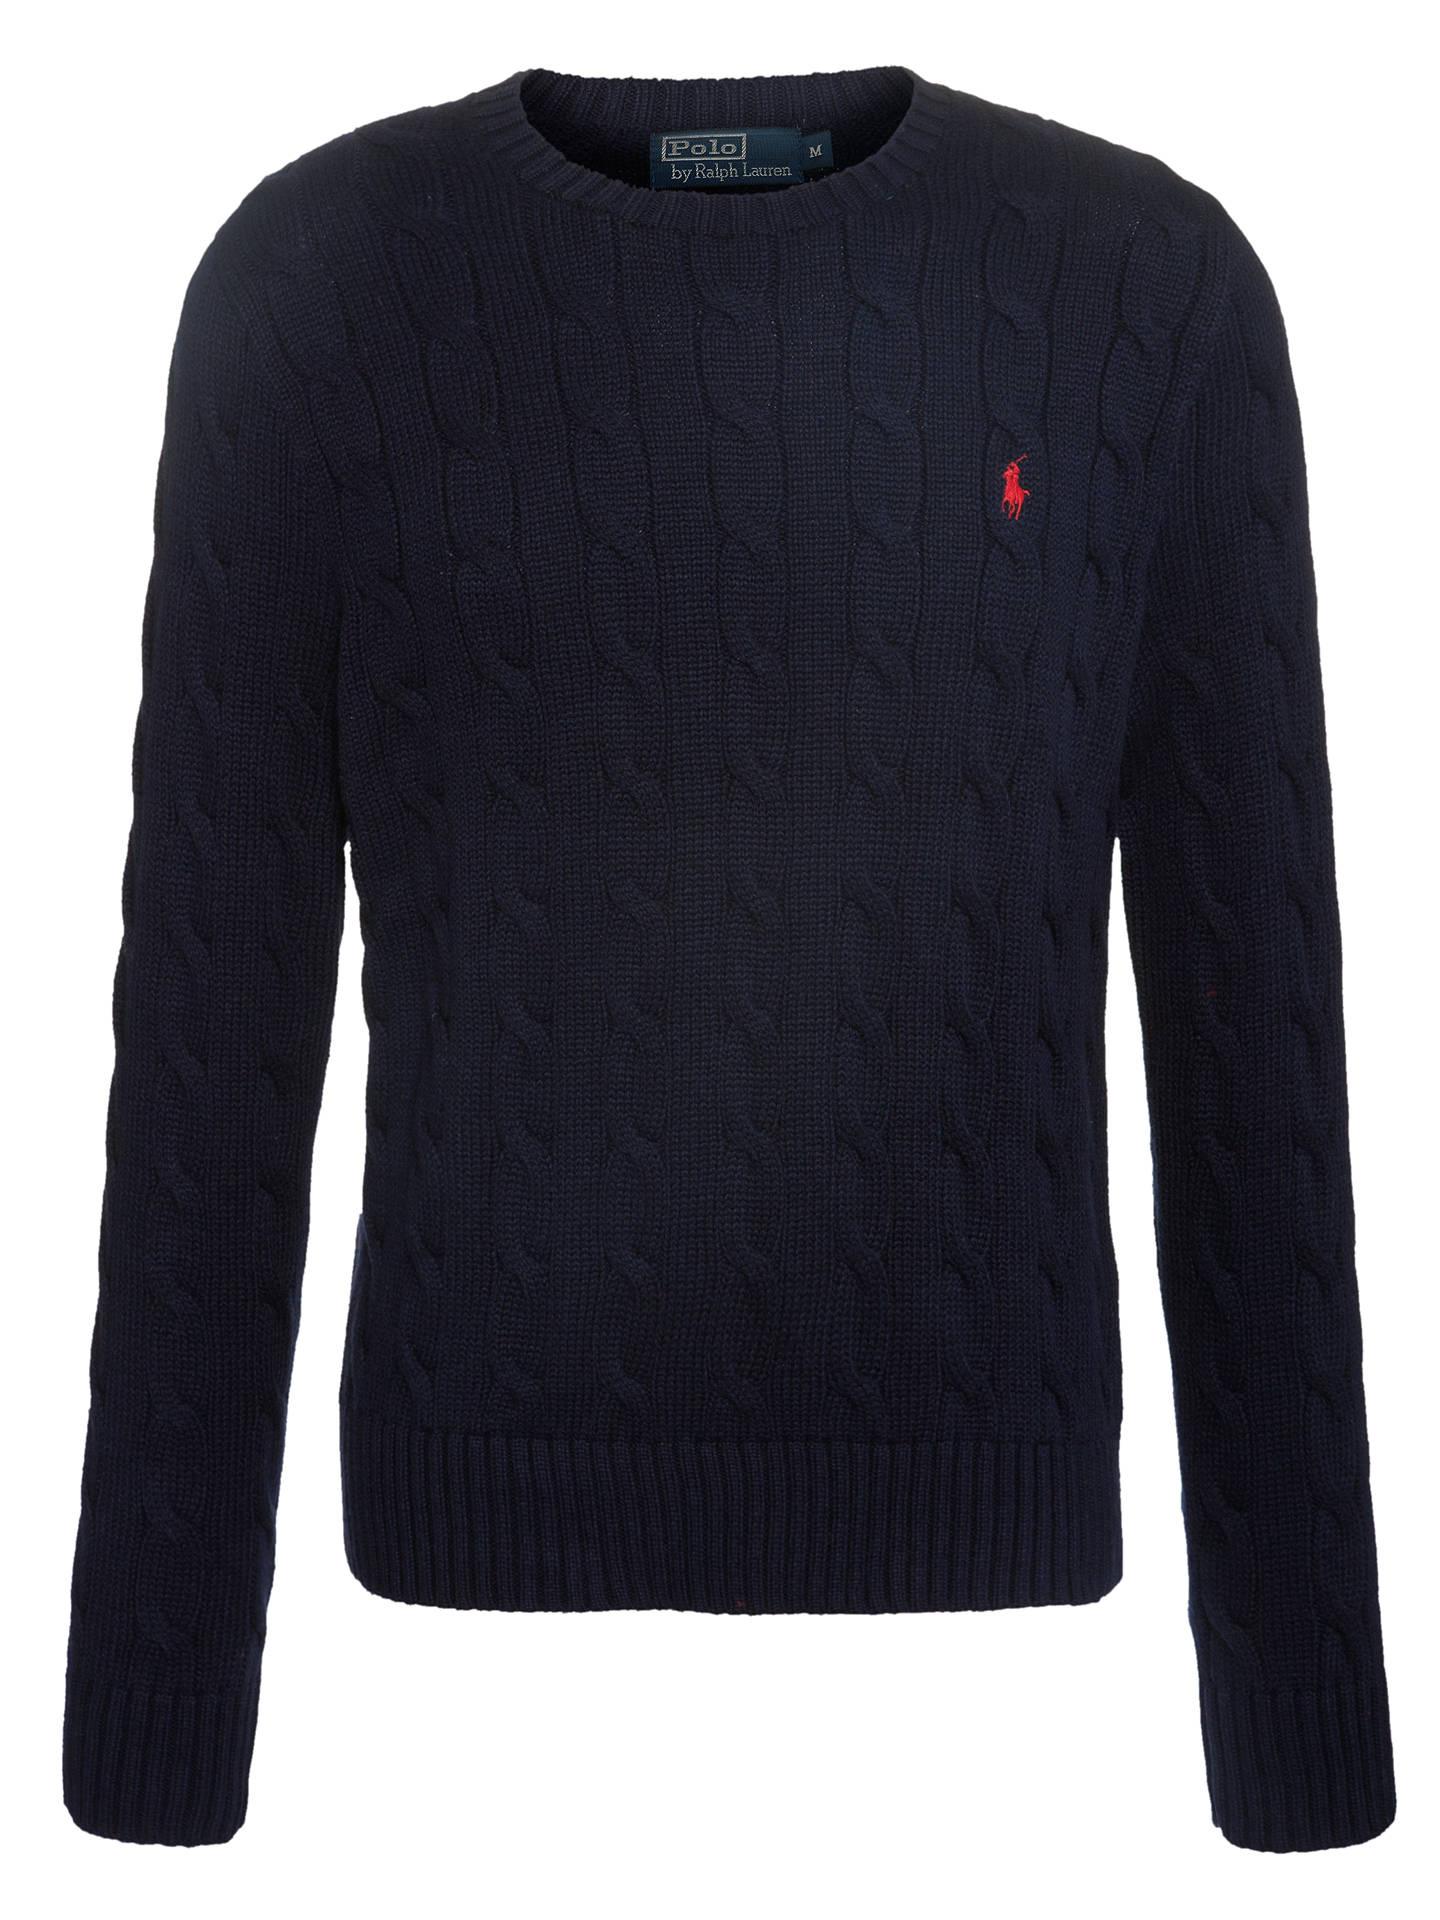 dcef4ffb19af0 Buy Polo Ralph Lauren Cotton Cable Knit Jumper